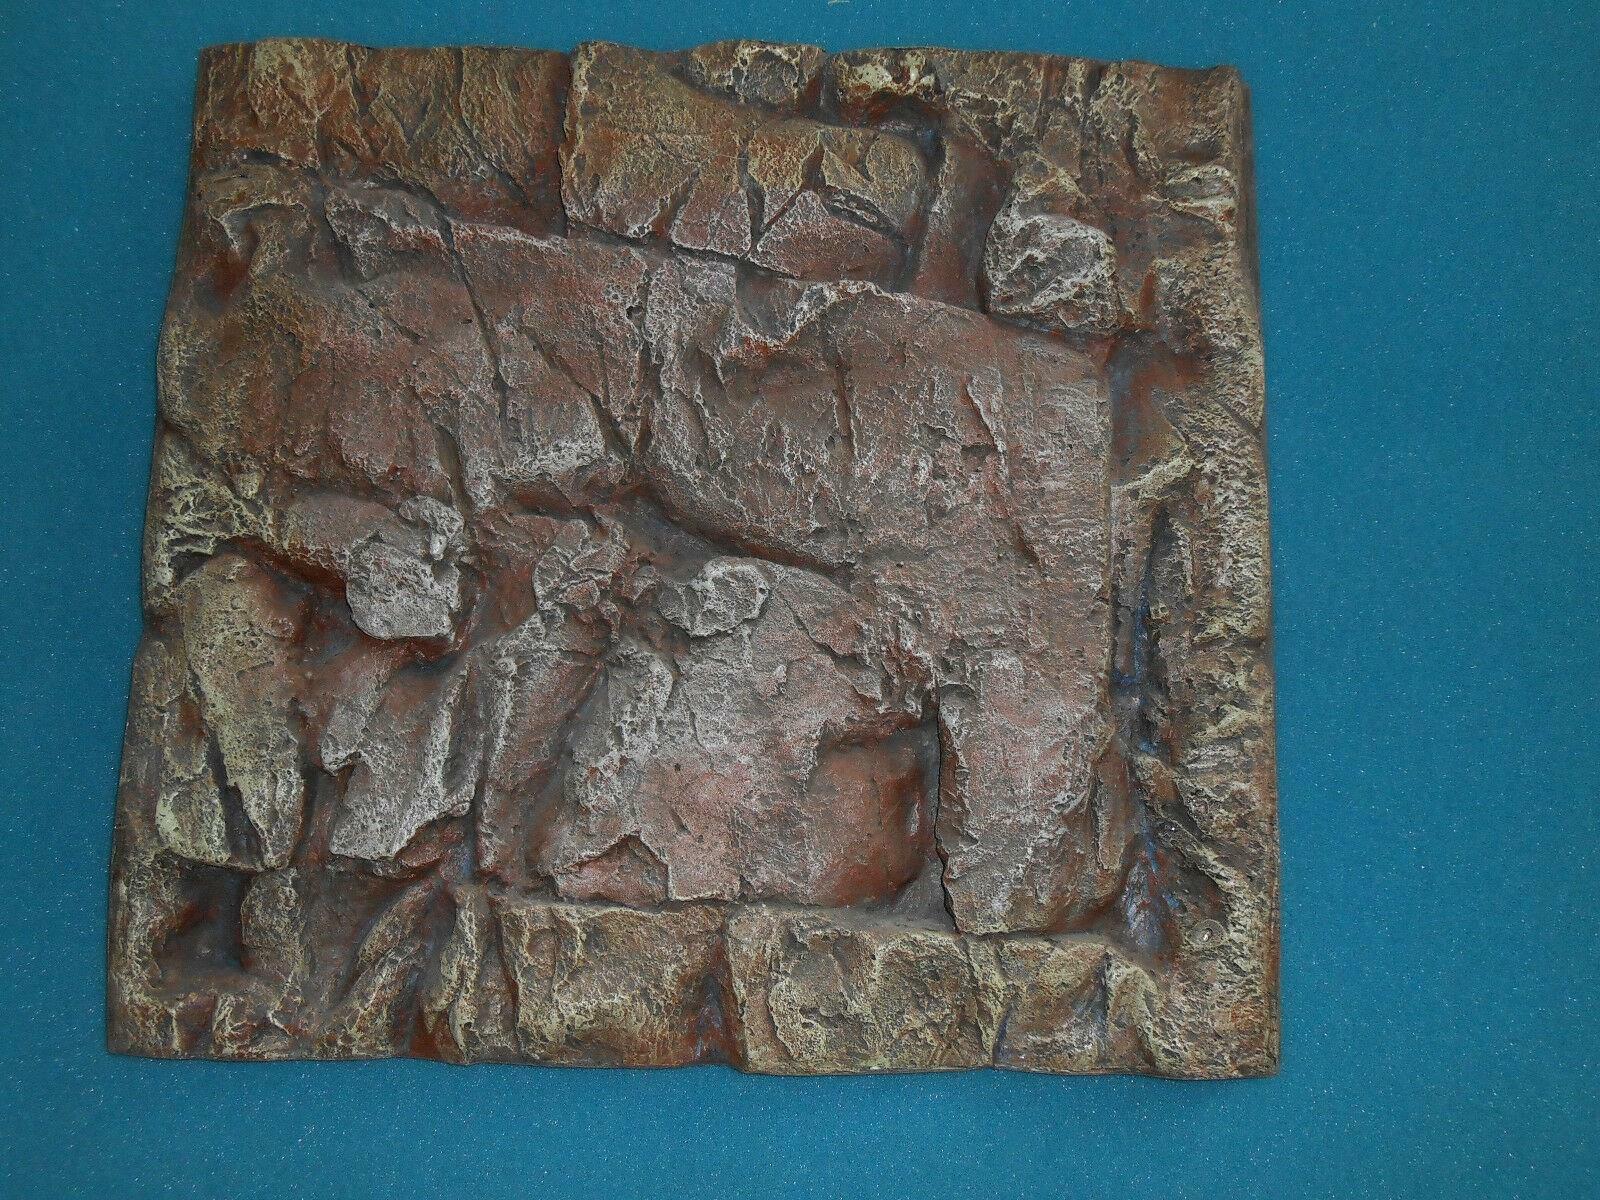 Hobby Aquarienrückwand Malawi 60x55x5 Hintergrund 3D Dekoration Aquarium w Juwel